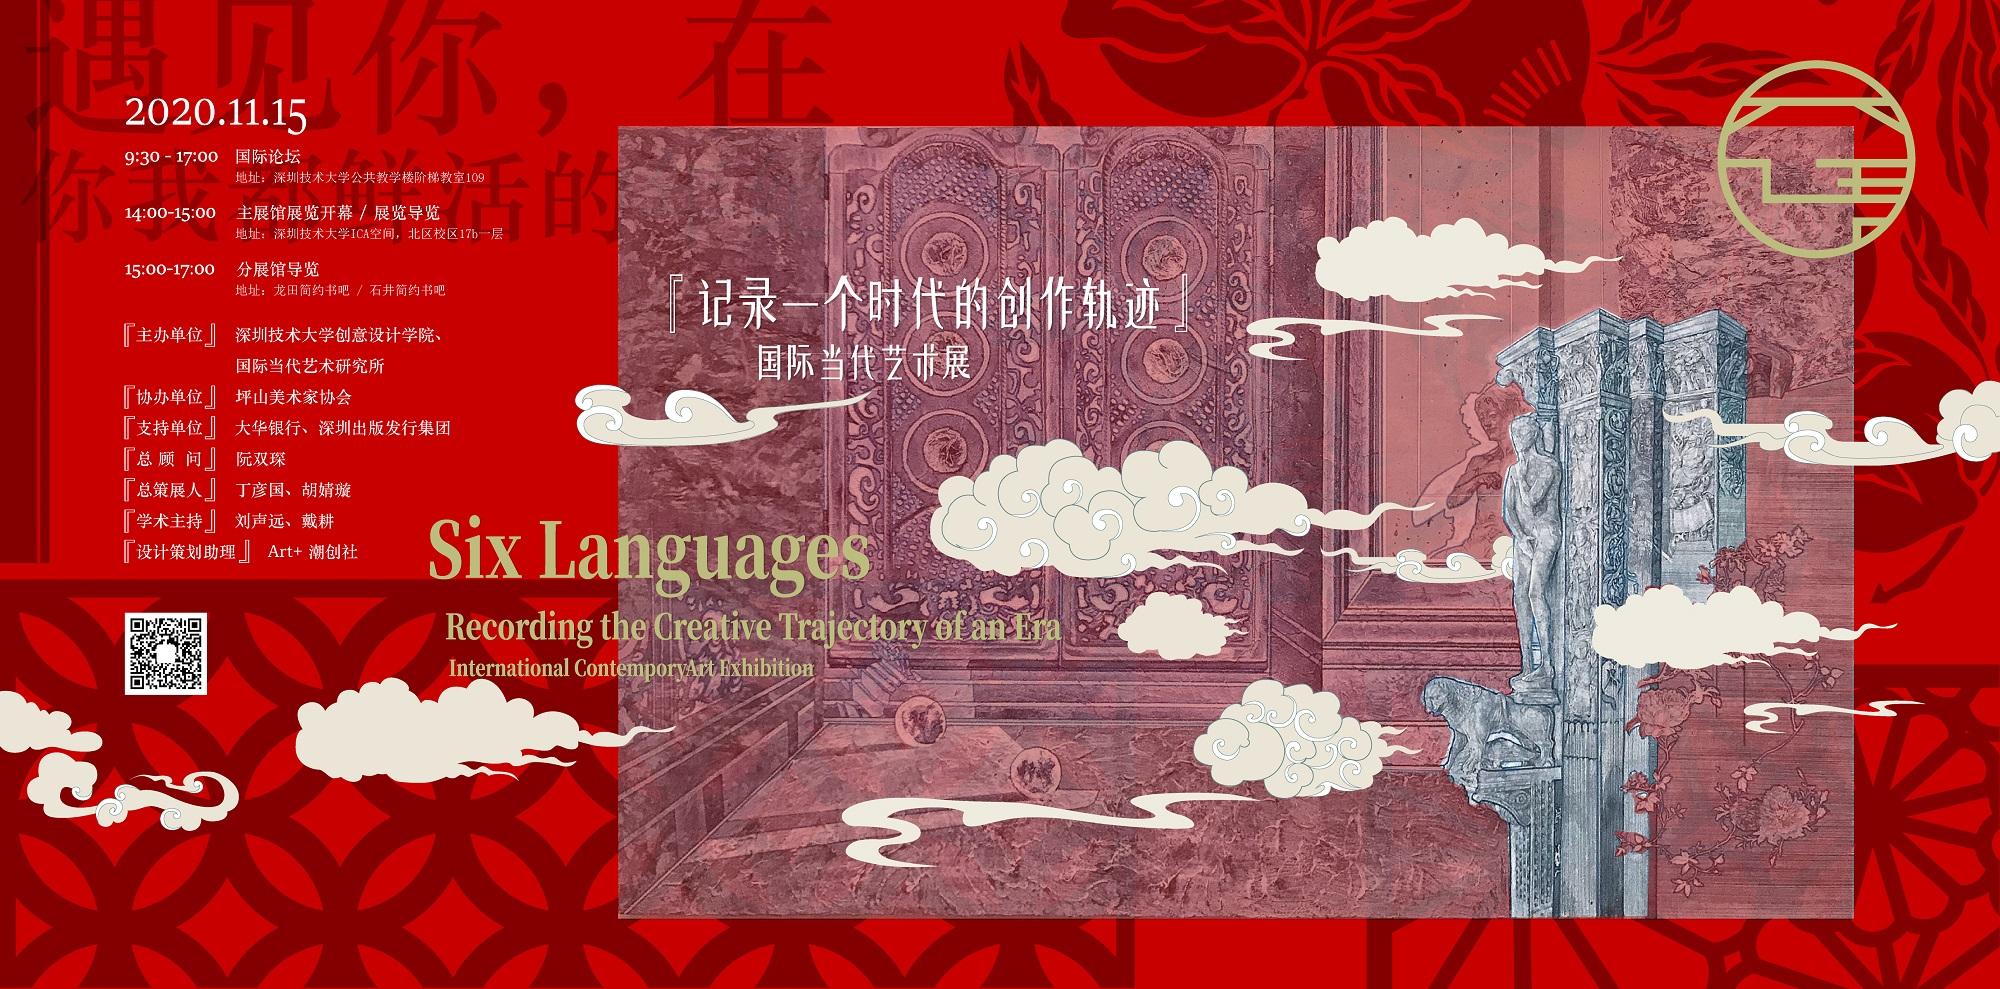 Shenzhen Tech University Intl art exhibi